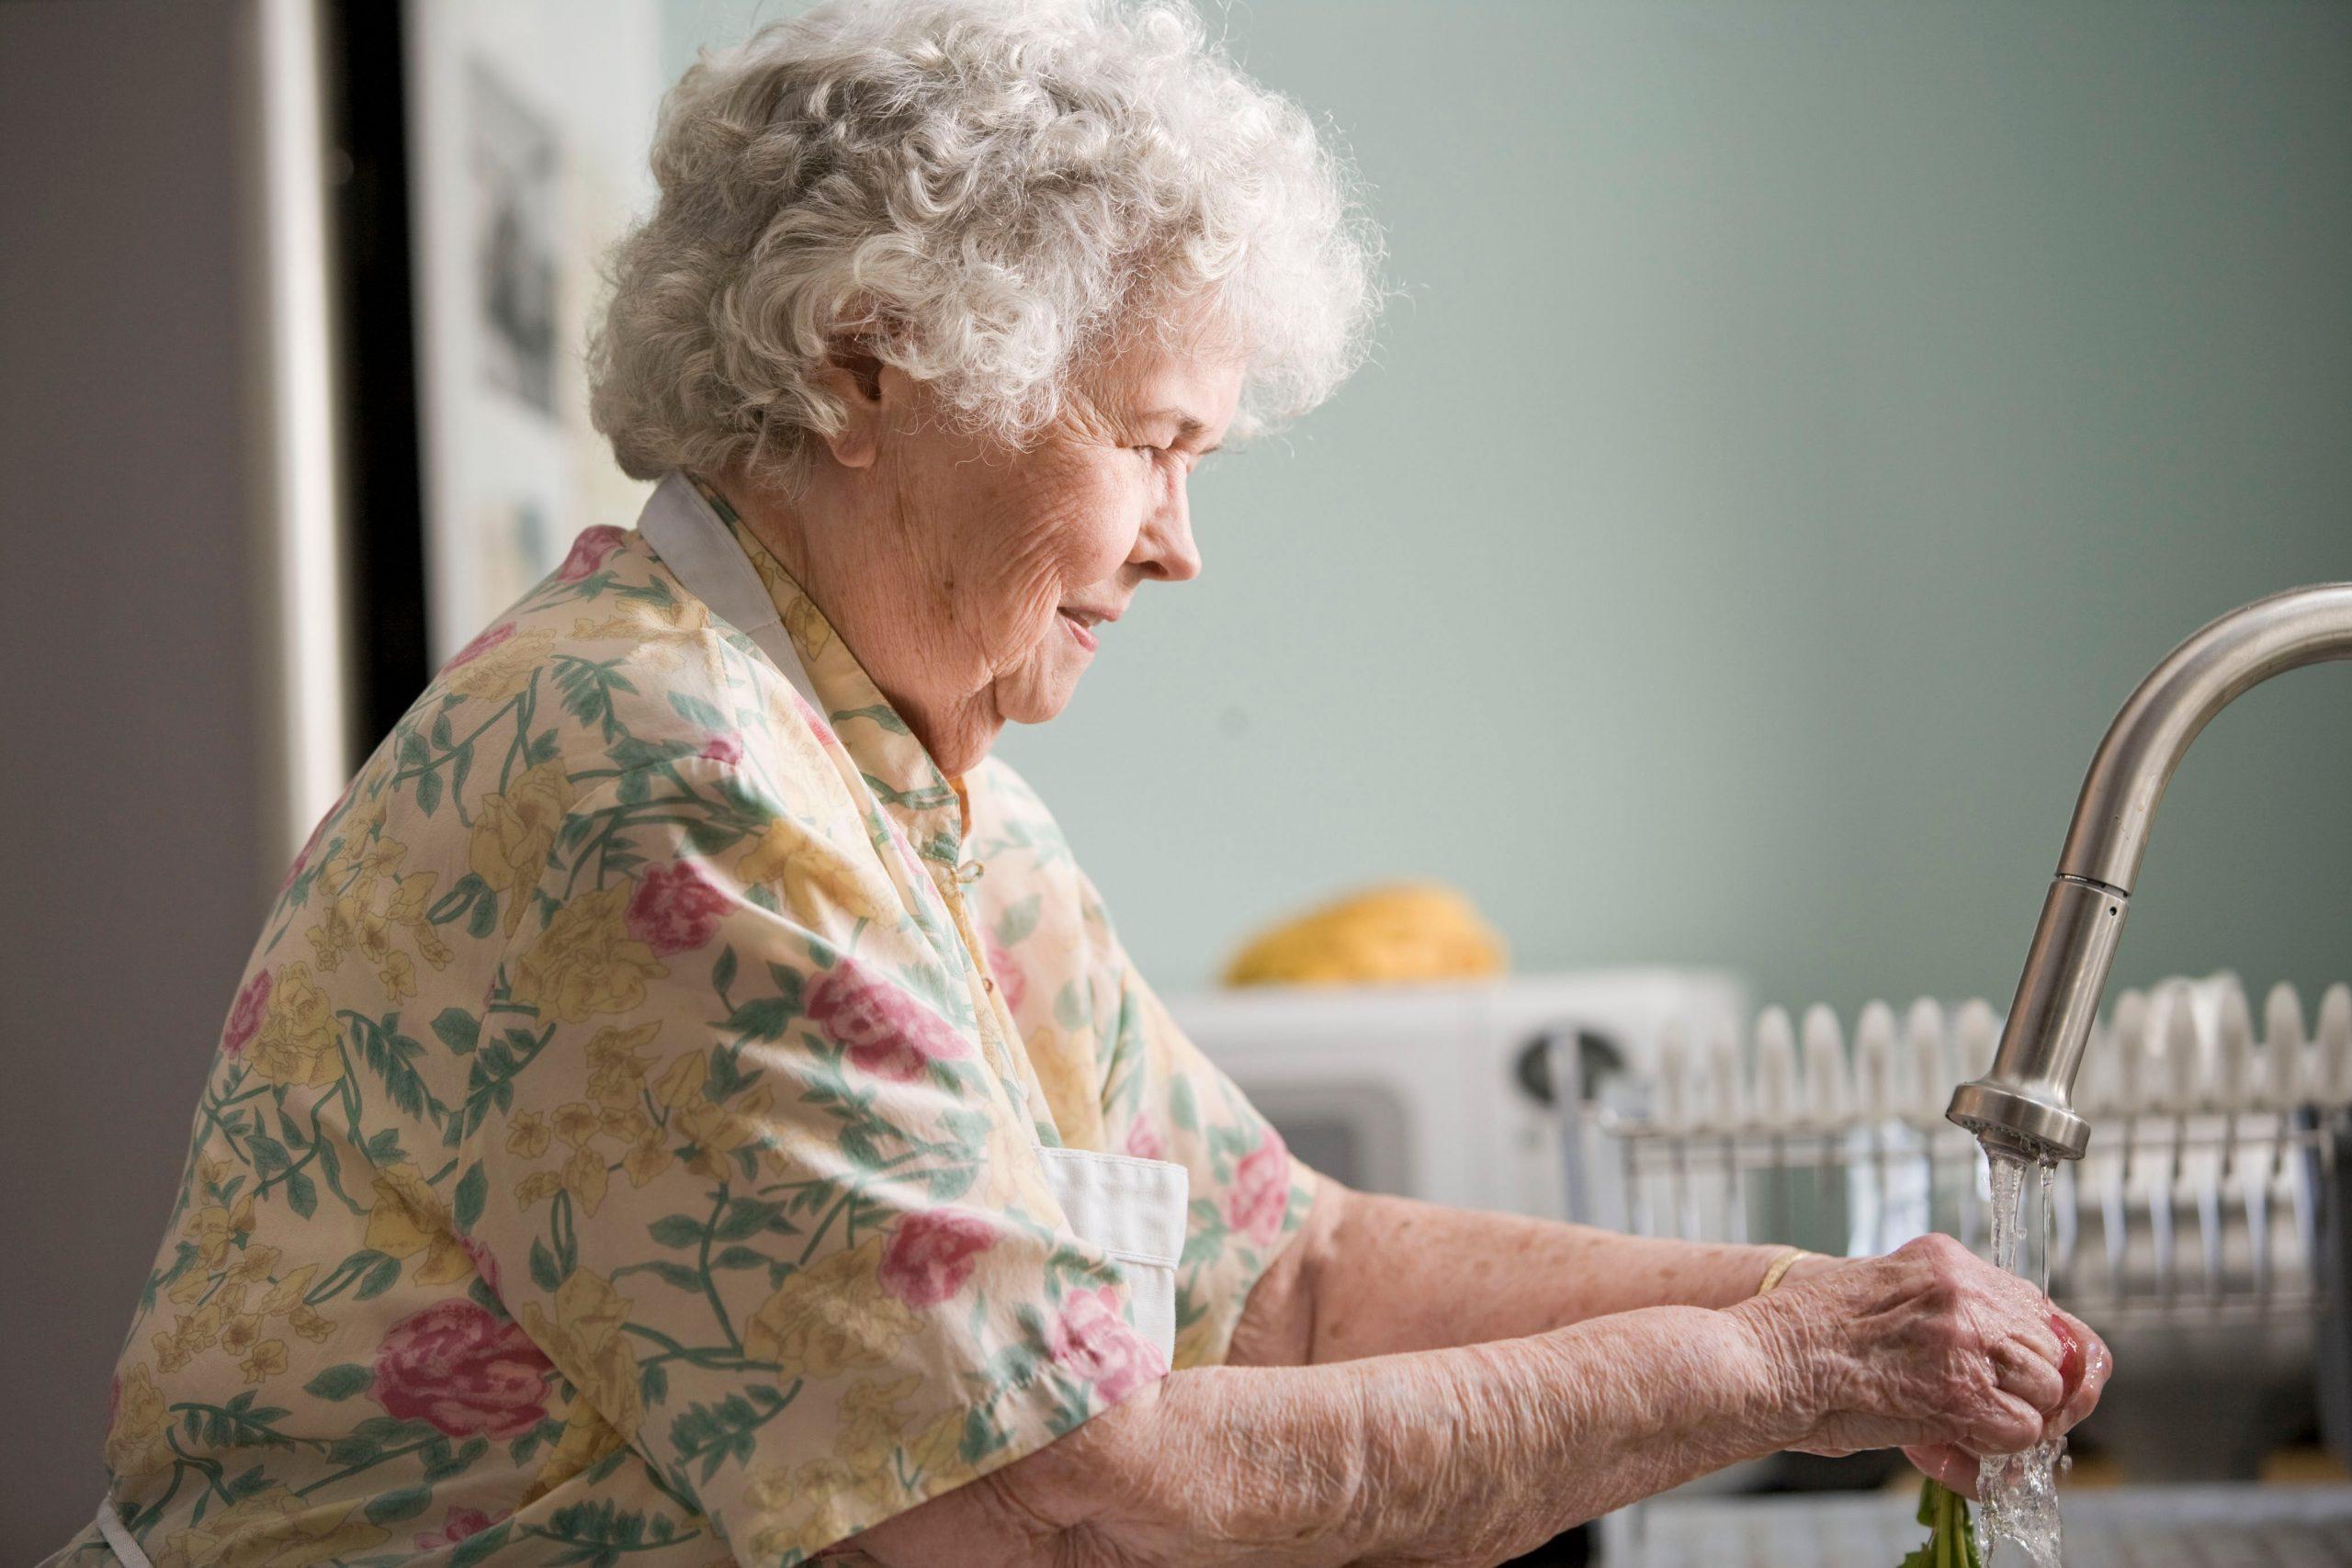 elder lady at sink washing hands